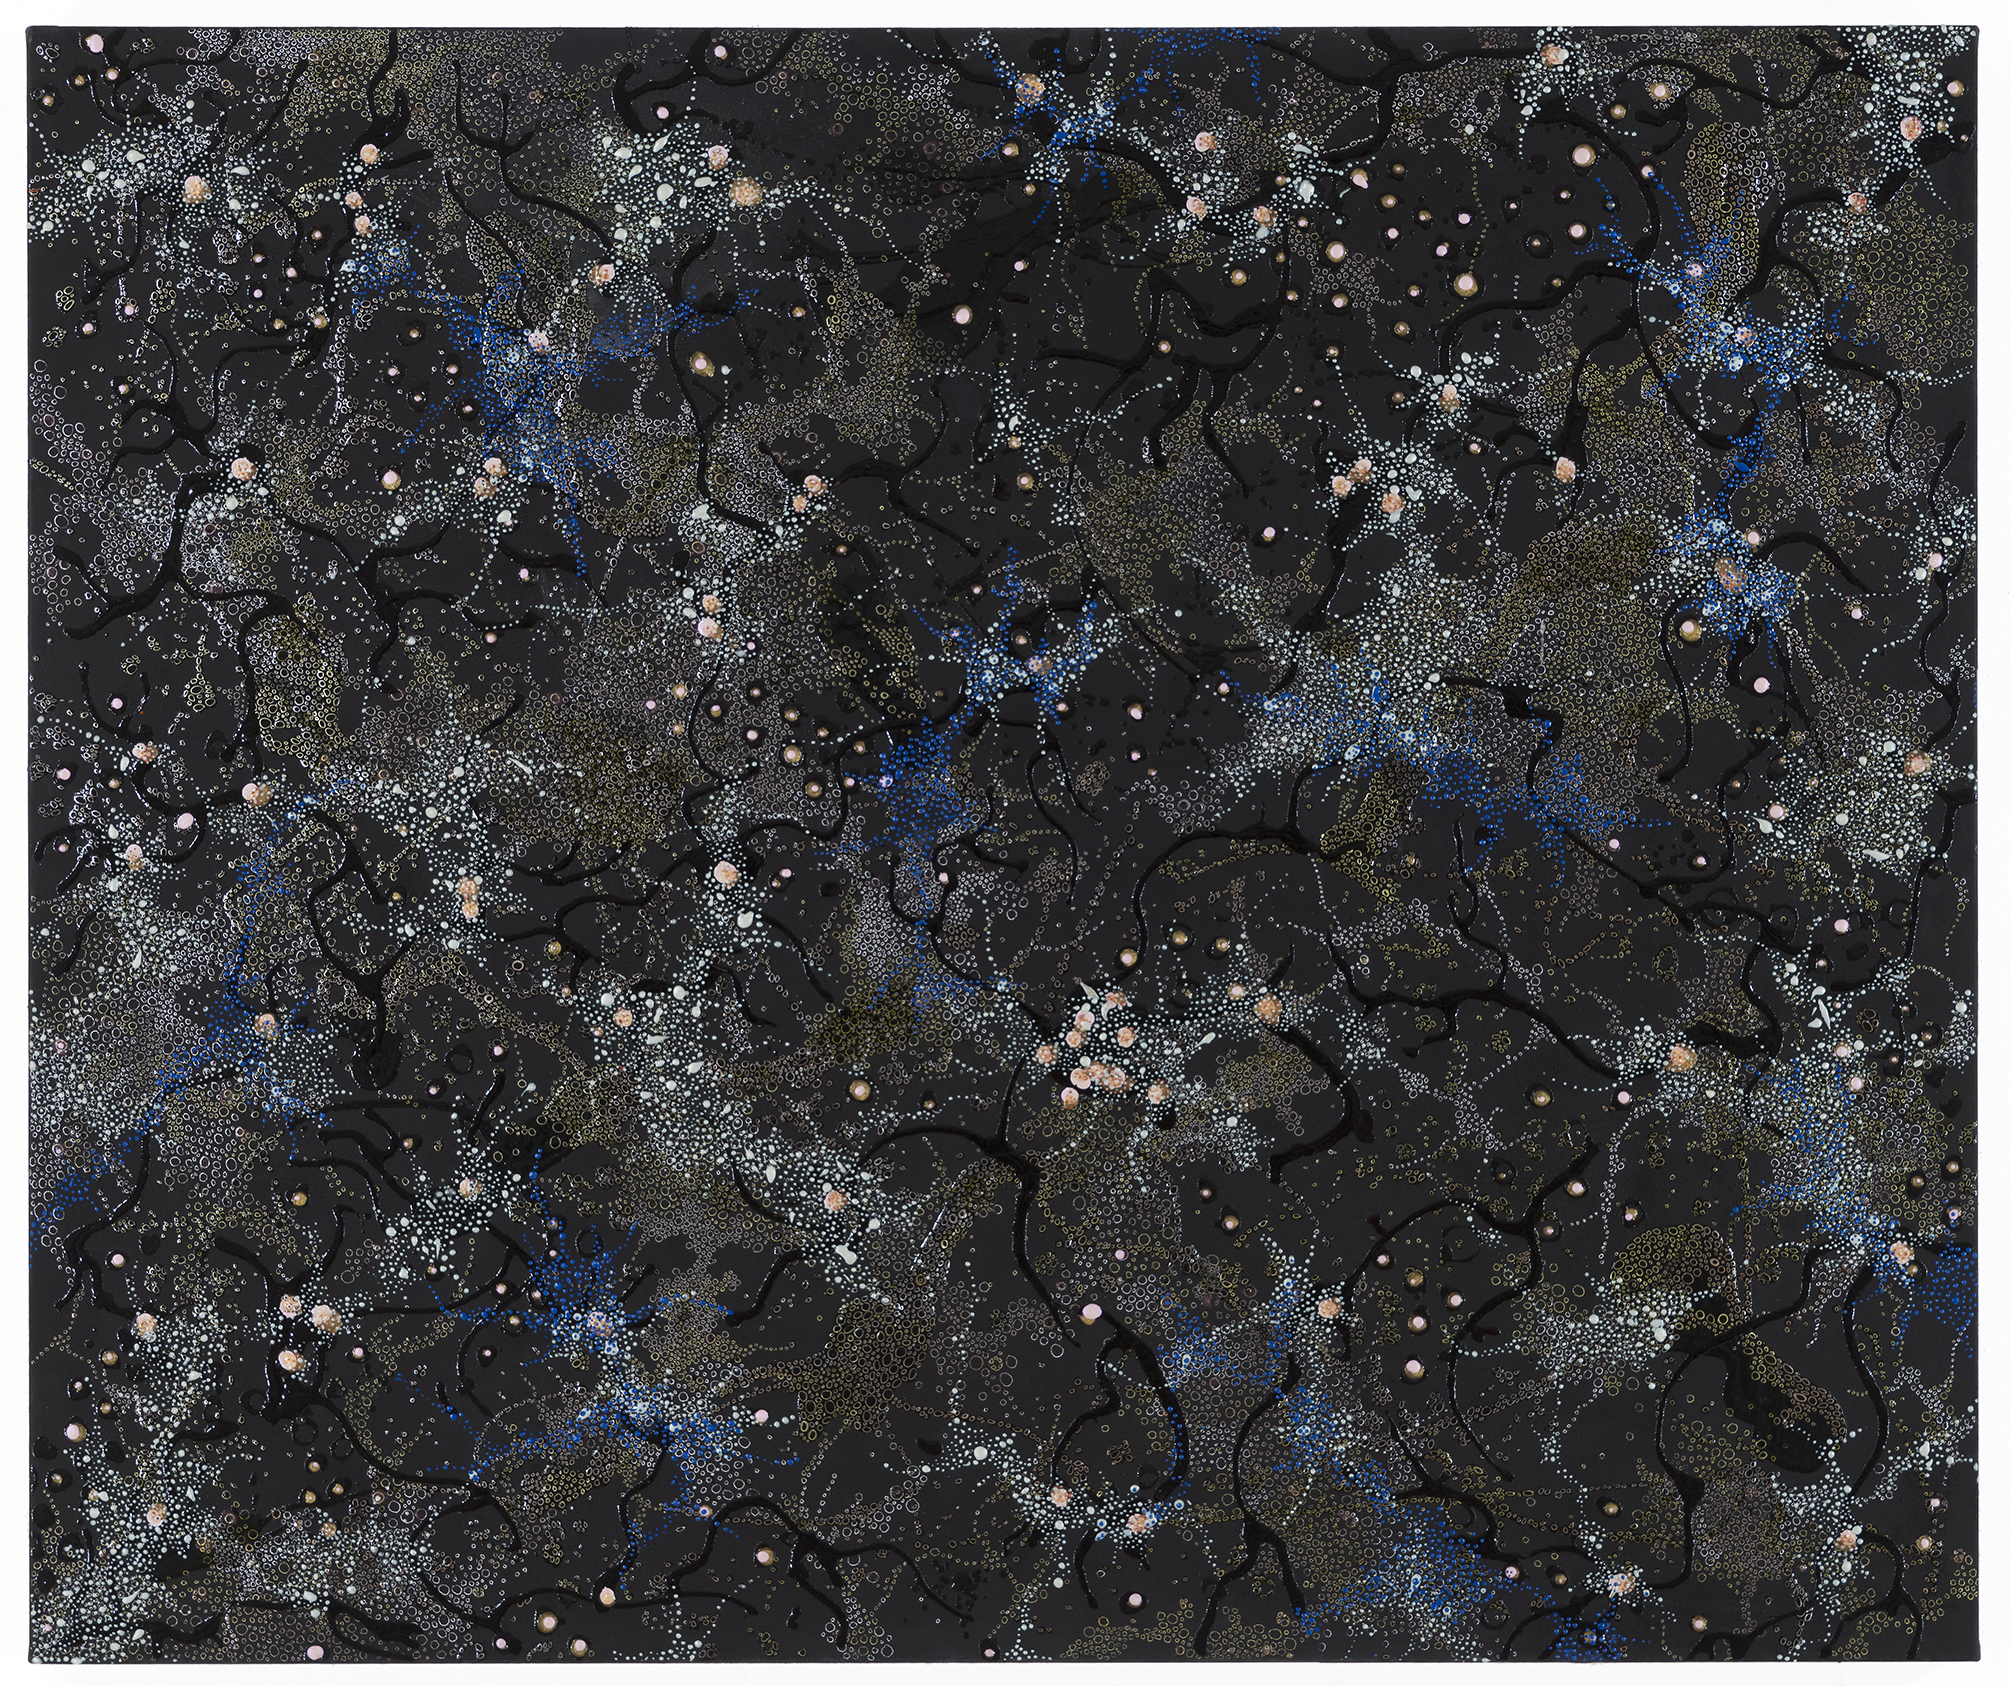 50x42 Cosmic Concourse by Artist Elizabeth Knowles